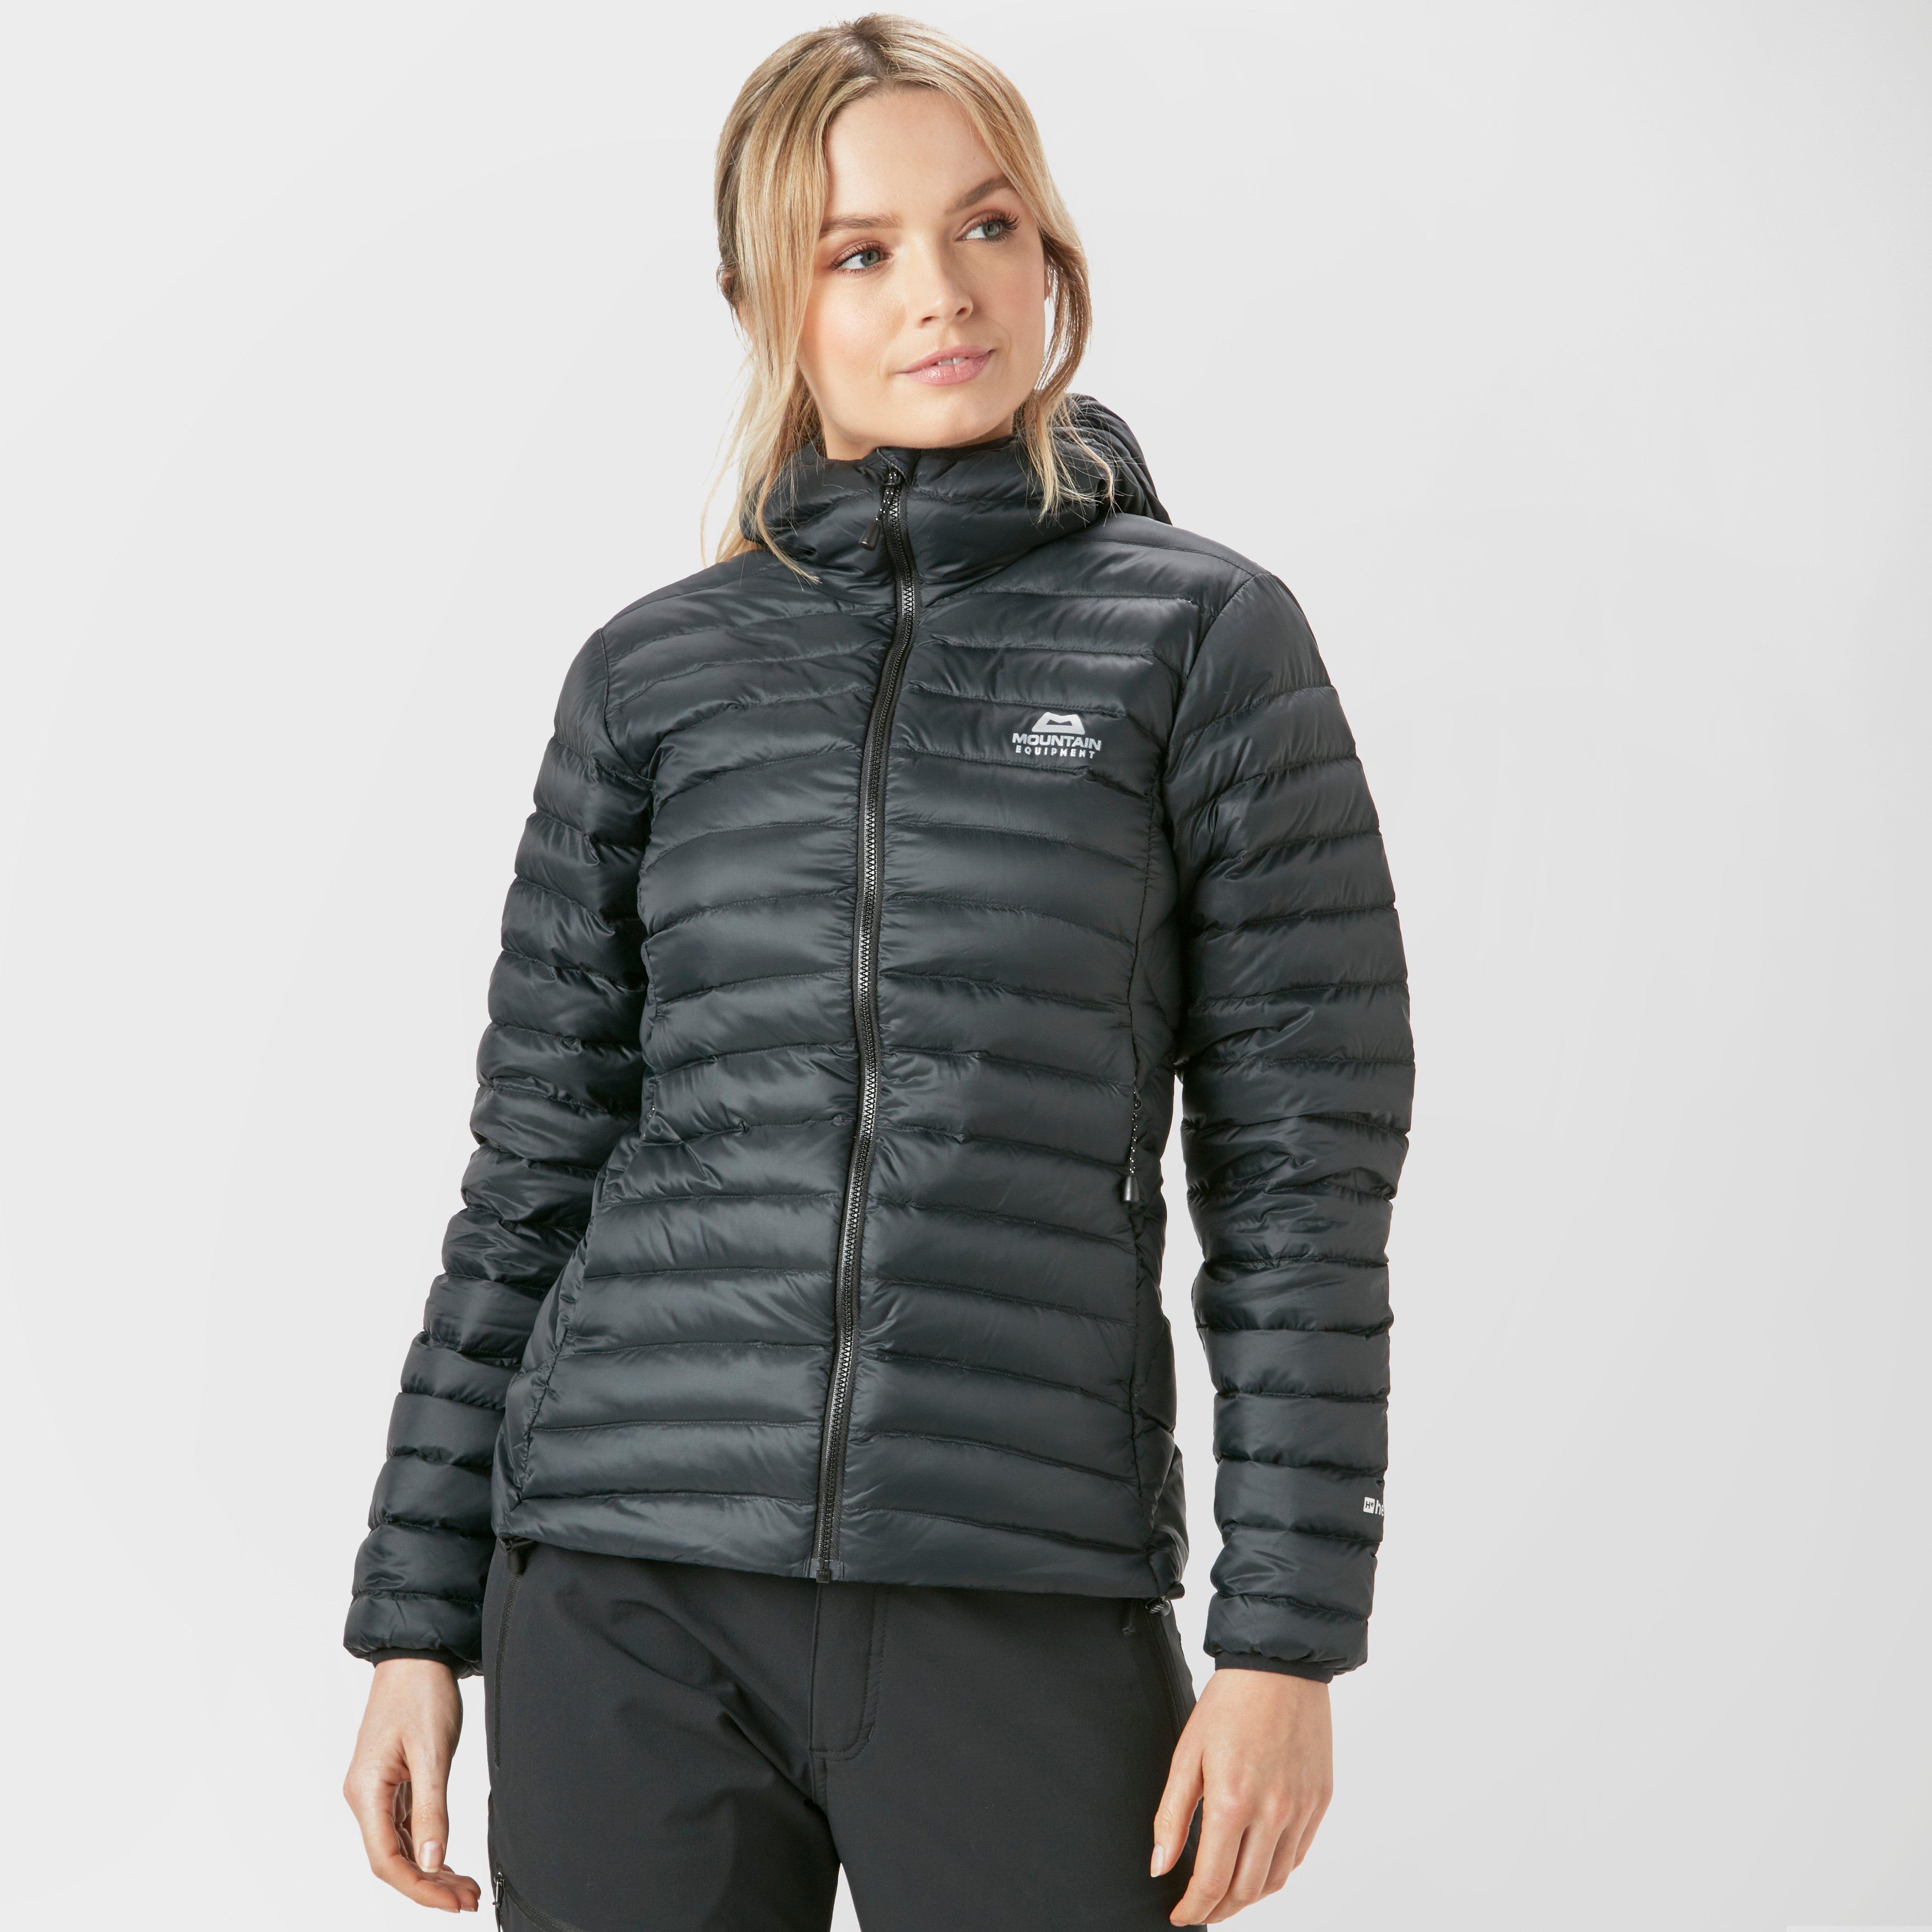 Mountain Equipment Women's Arete Hooded Down Jacket, Black